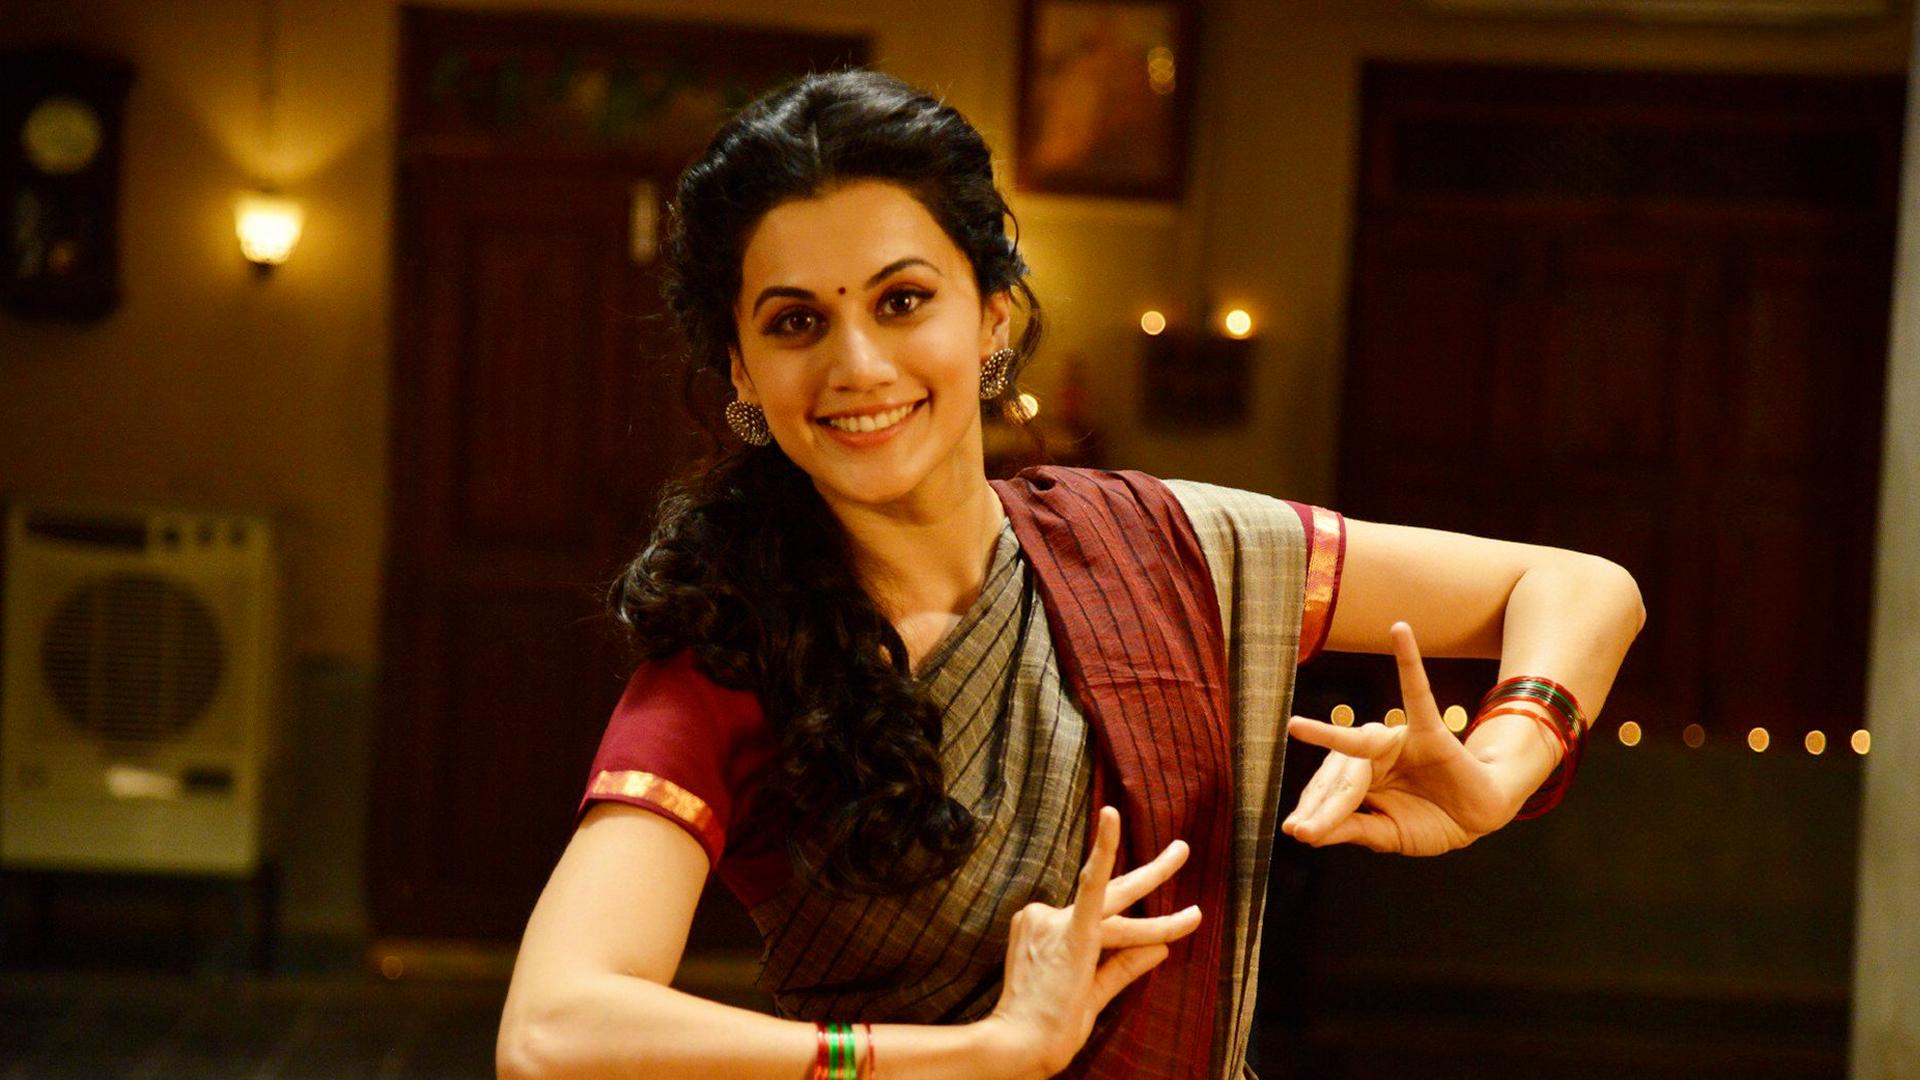 Anando Brahma Download Full Movie Tamilrockers Isaimini